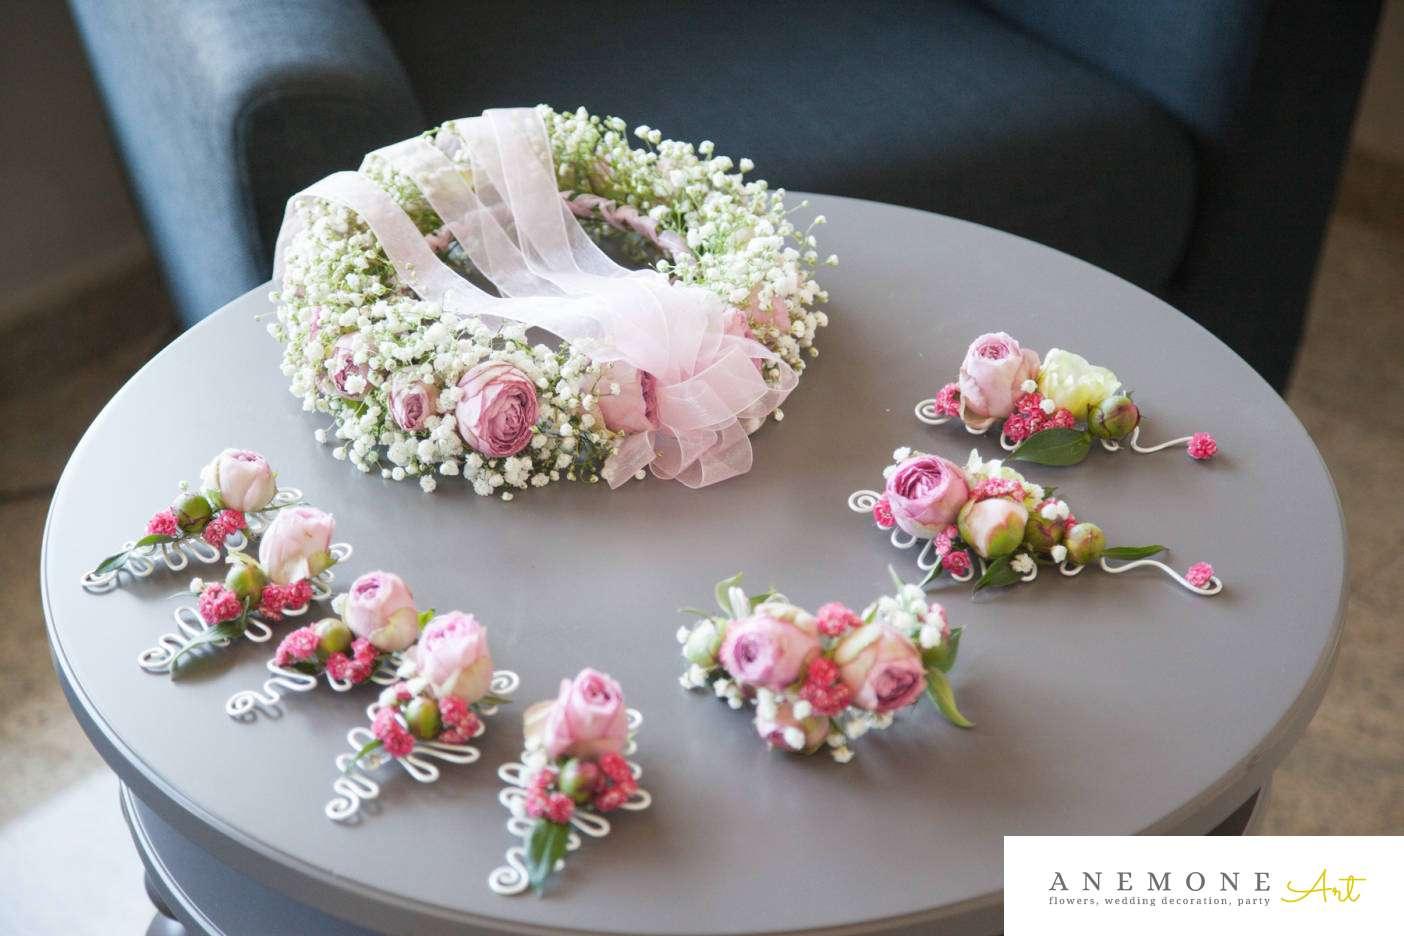 Poza, foto cu Flori de nunta anemone, bujori, cocarda, coronita, roz, trandafiri englezesti in Arad, Timisoara, Oradea (wedding flowers, bouquets) nunta Arad, Timisoara, Oradea